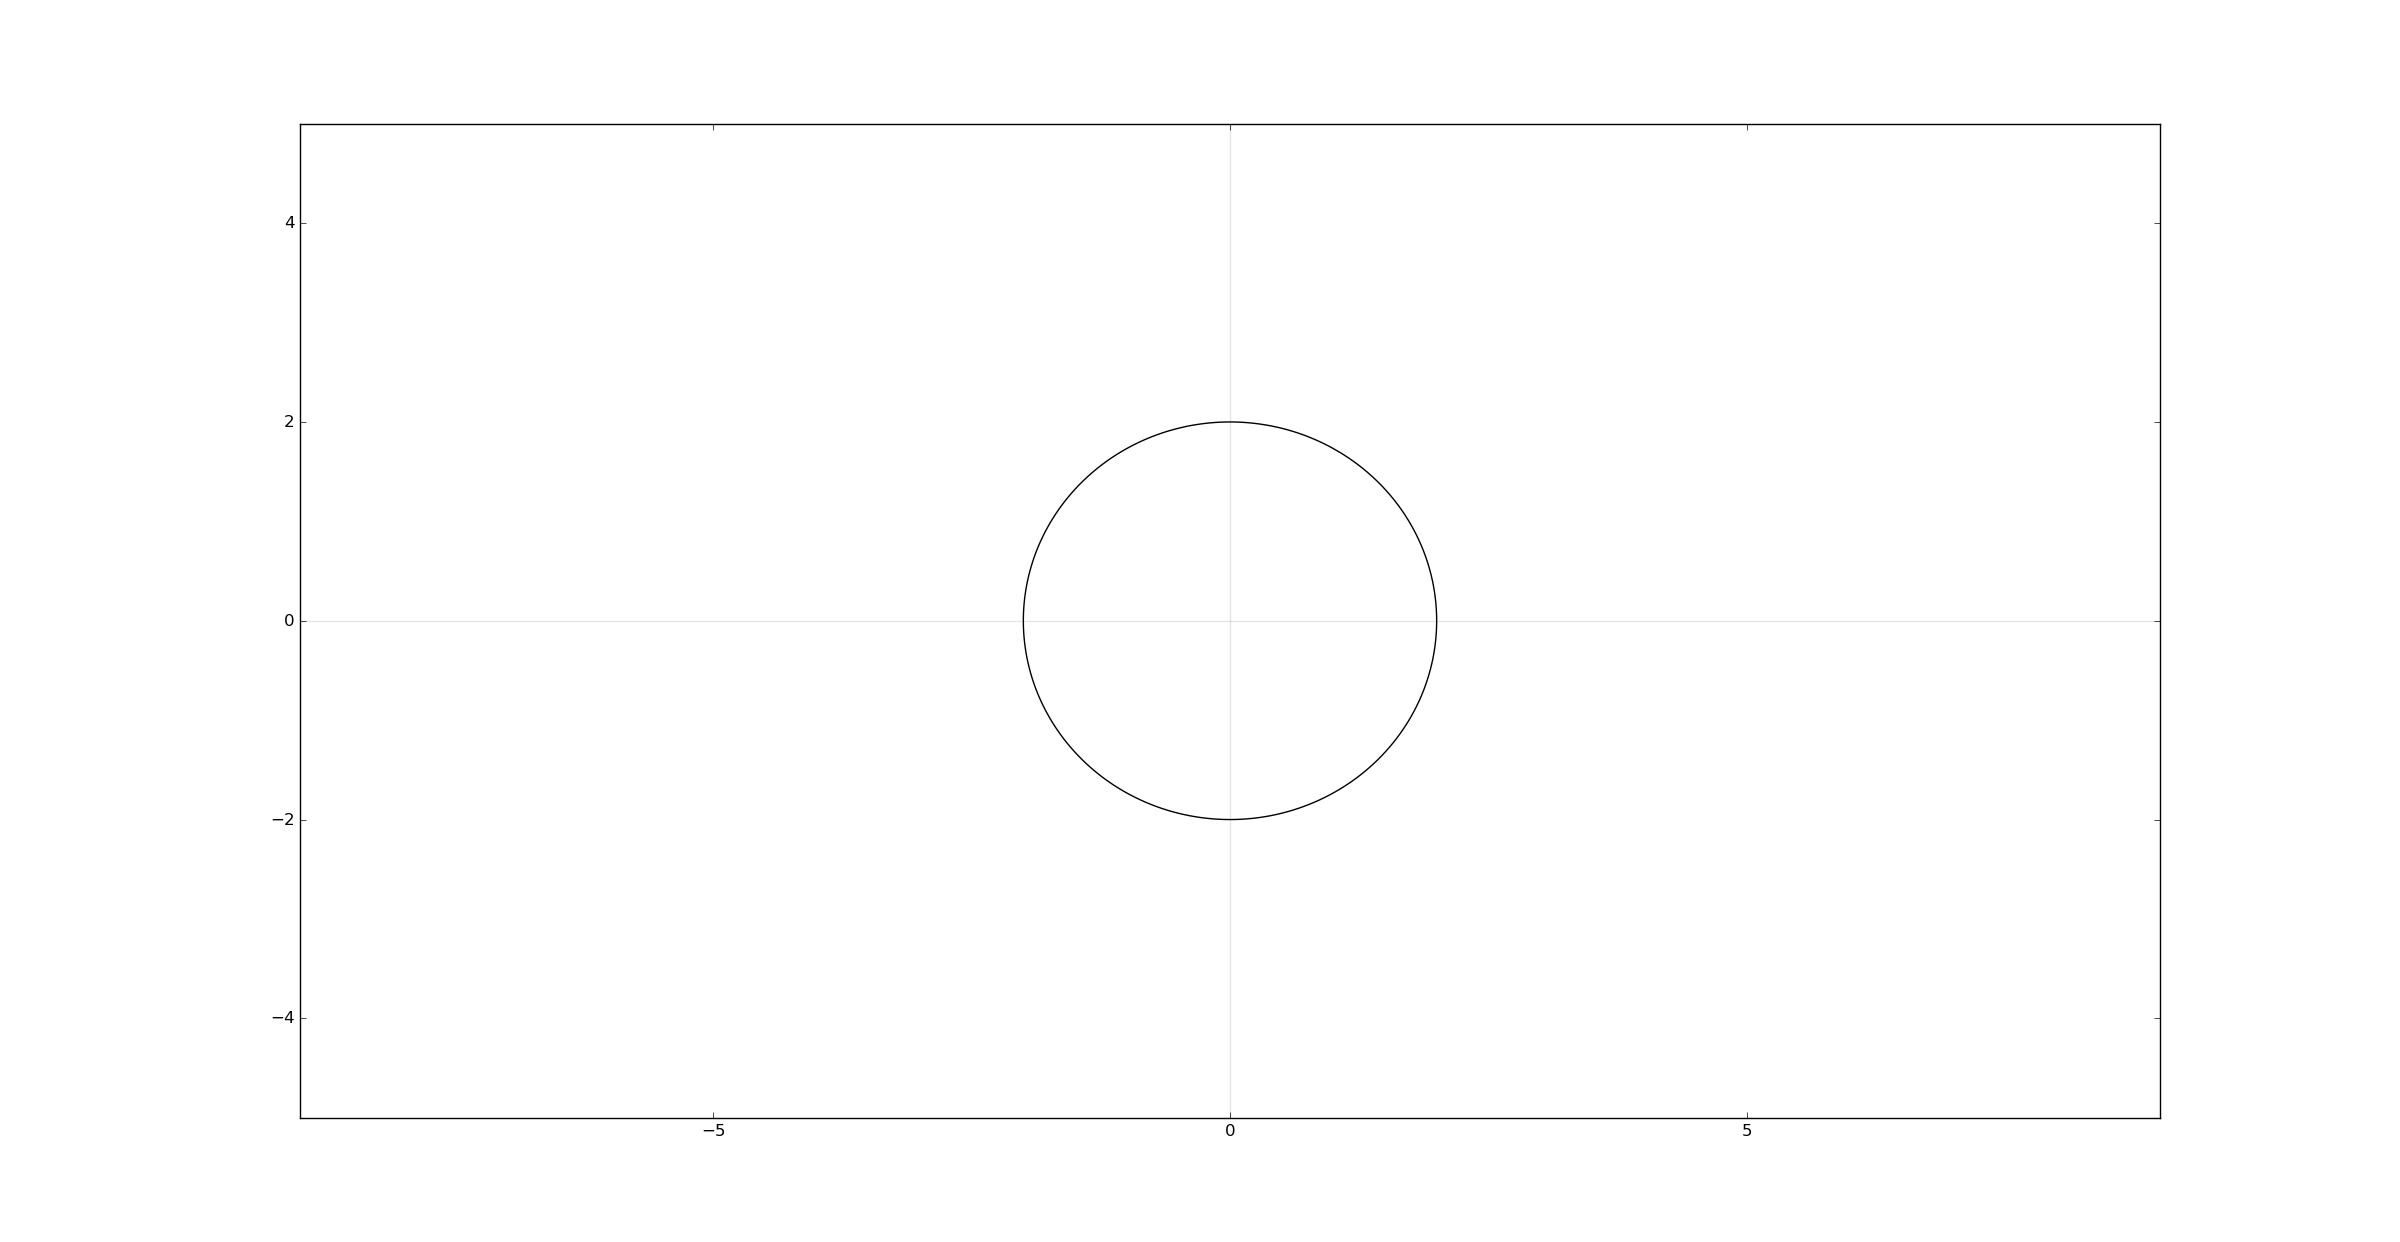 Python Matplotlib circle